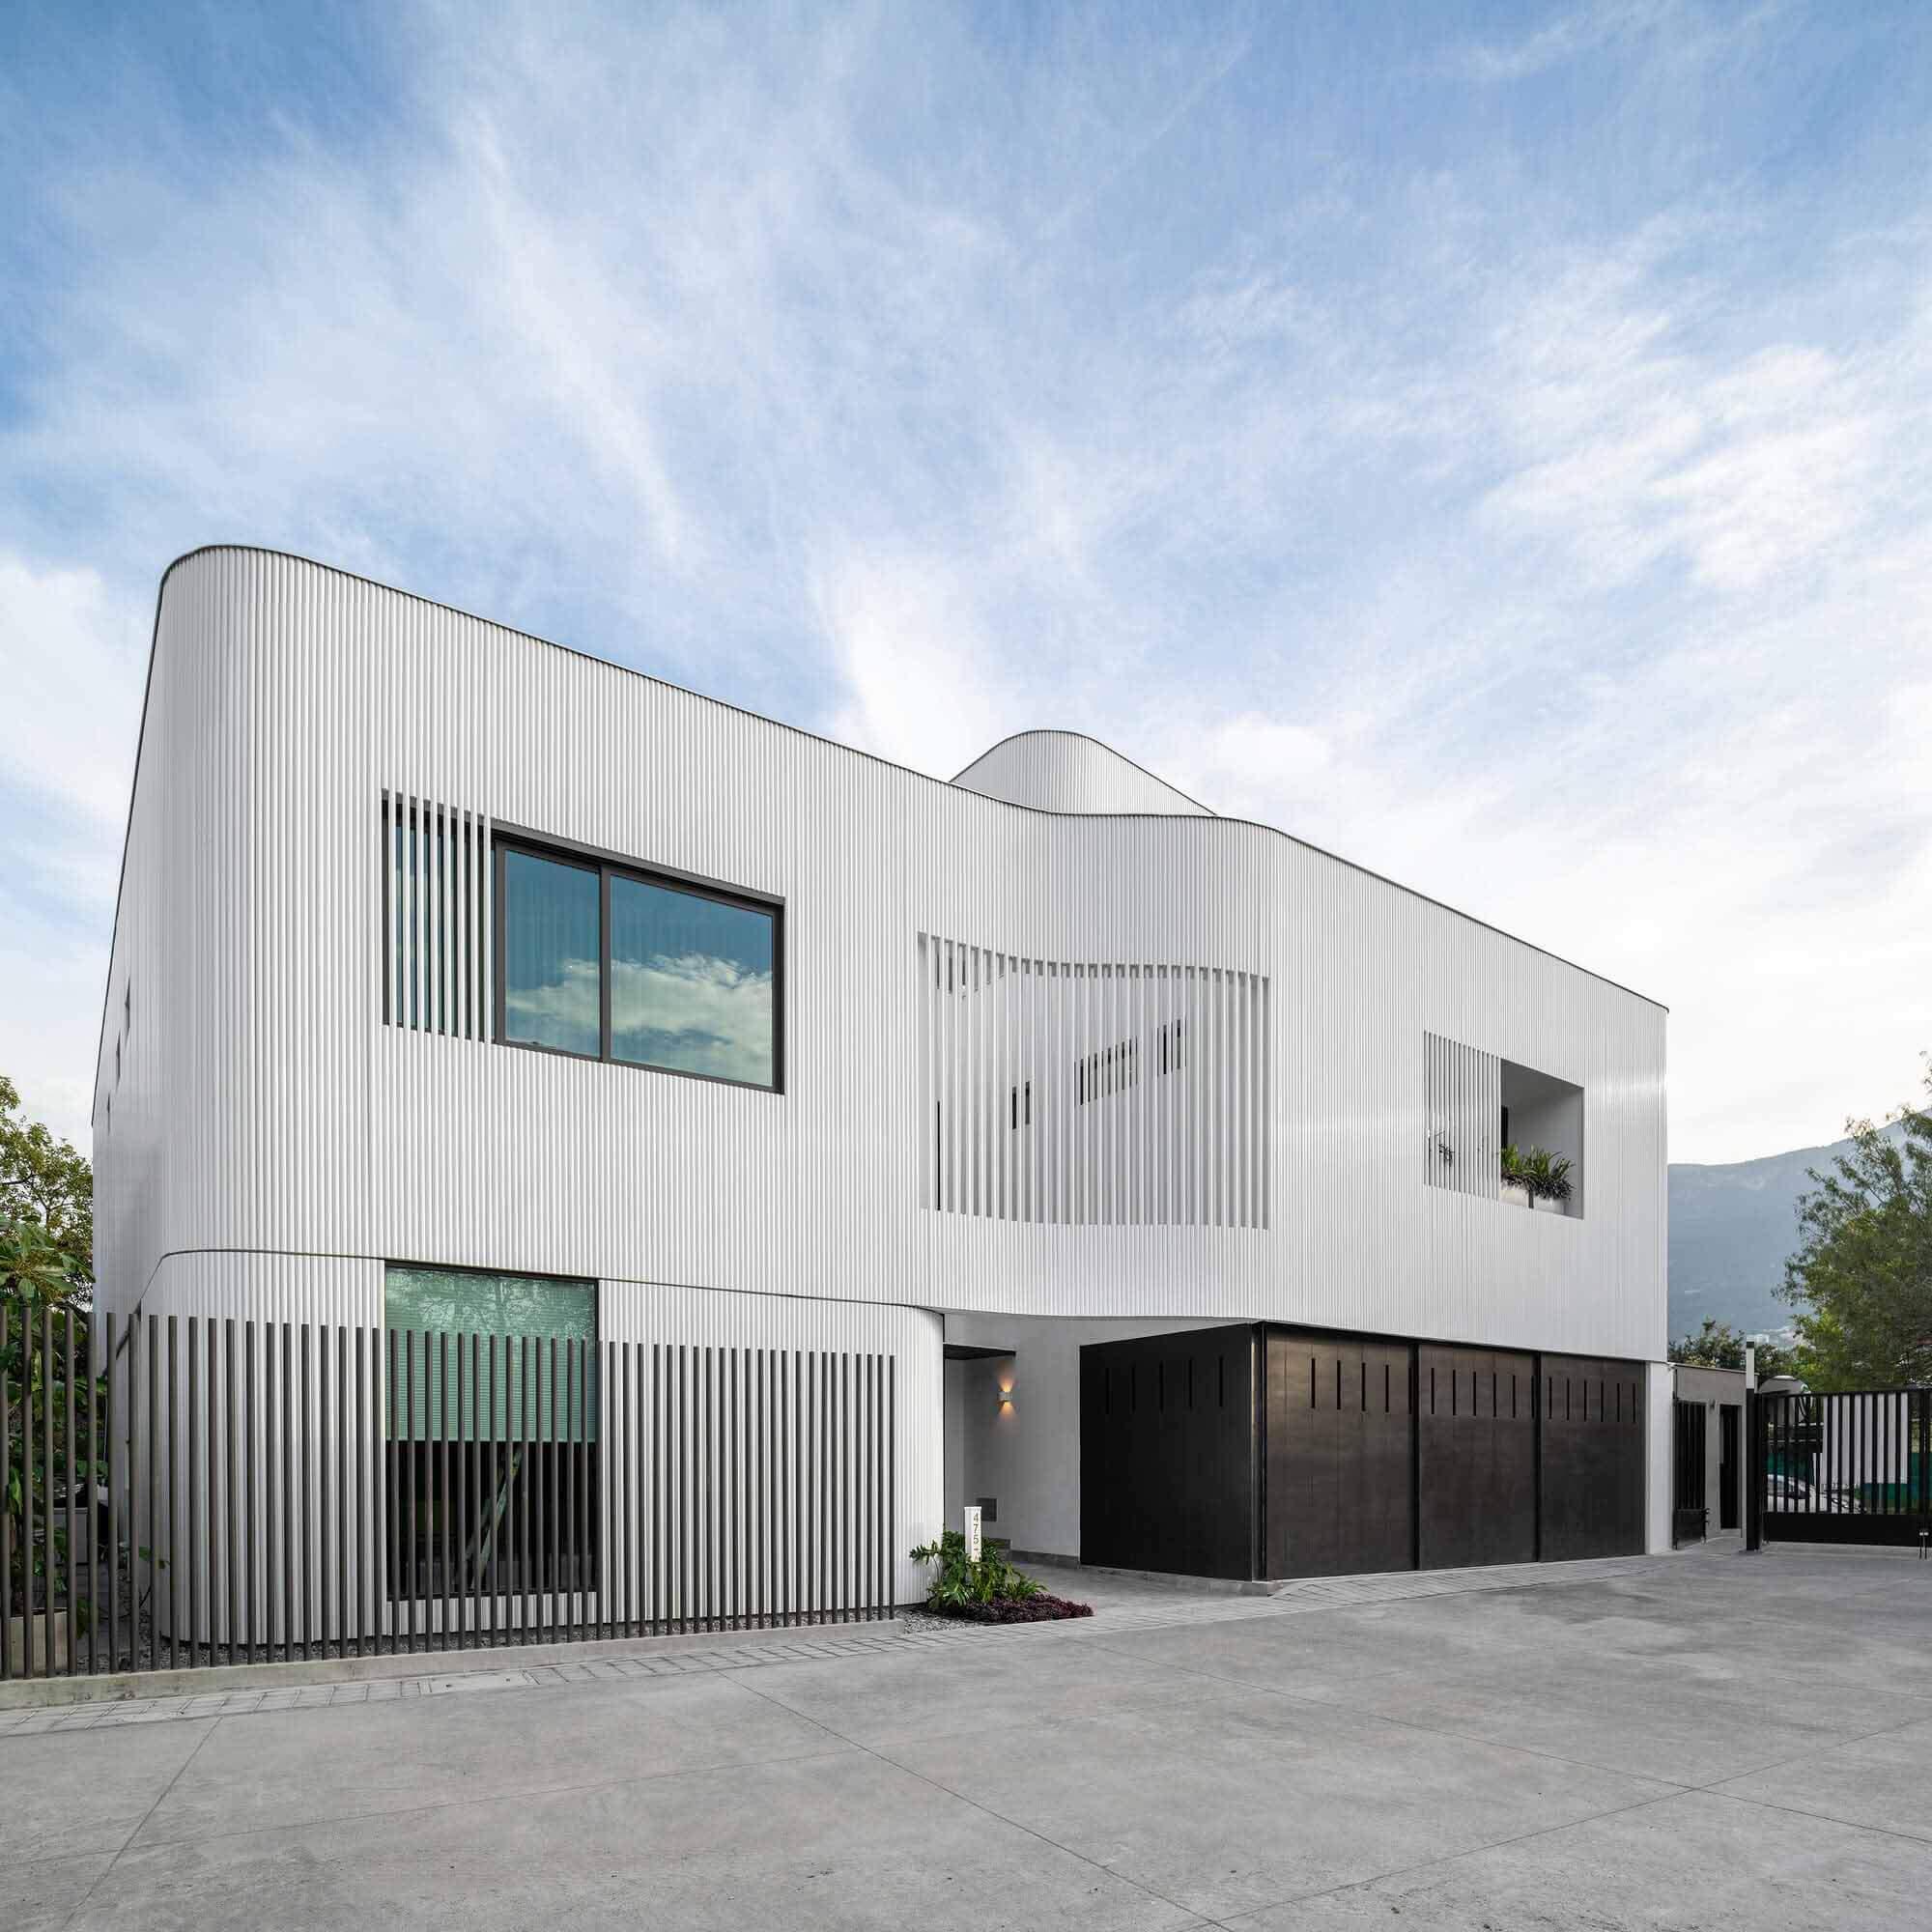 Casa Ferrum / Miró Rivera Architects + Ibarra Aragón Arquitectura